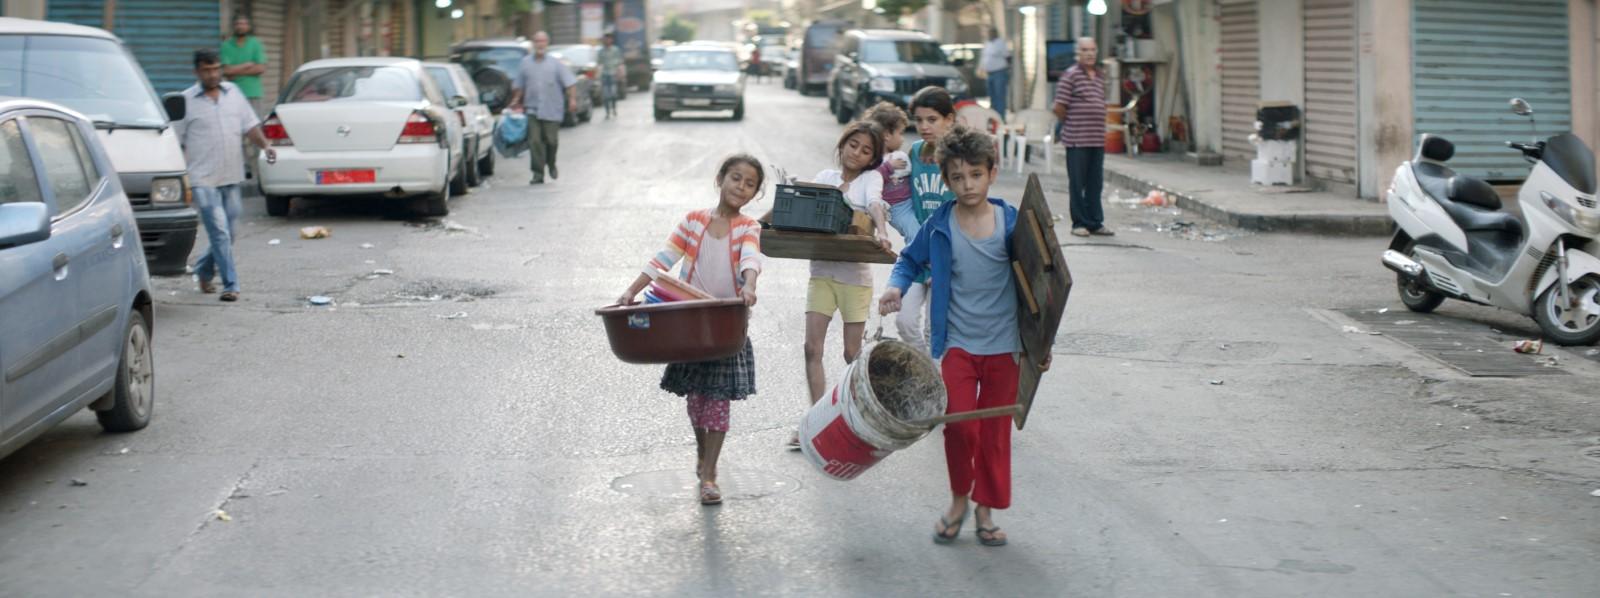 Cafarnaúm dirigida por Nadine Labaki